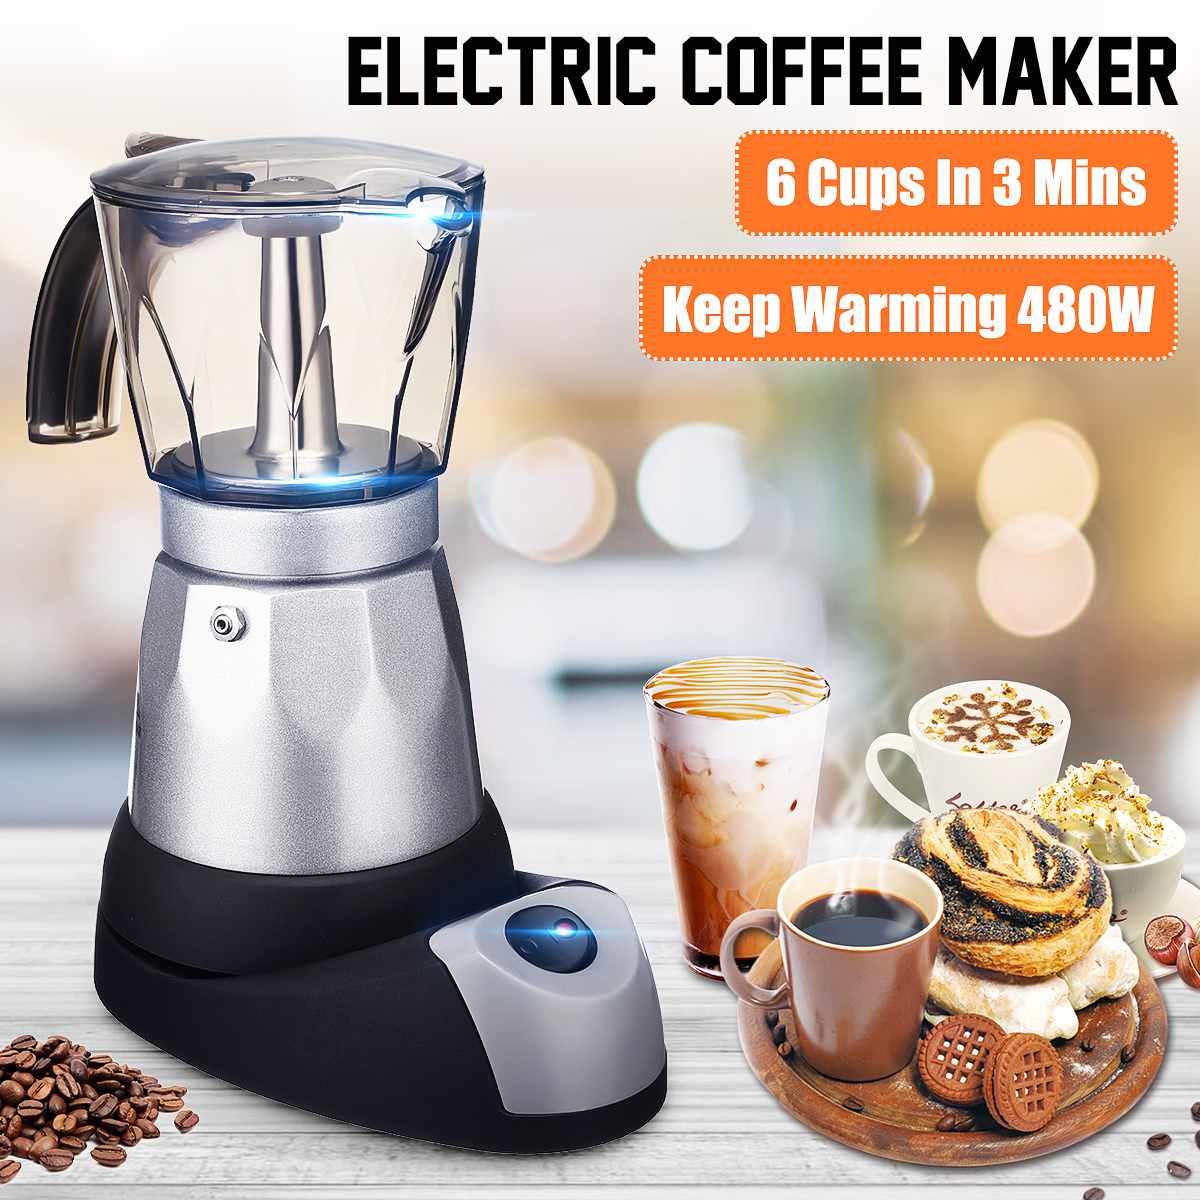 480W 220V Espresso Italian Mocha Maker Coffee Percolators Electric Moka Pot EU Plug Portable Electric Coffee Maker